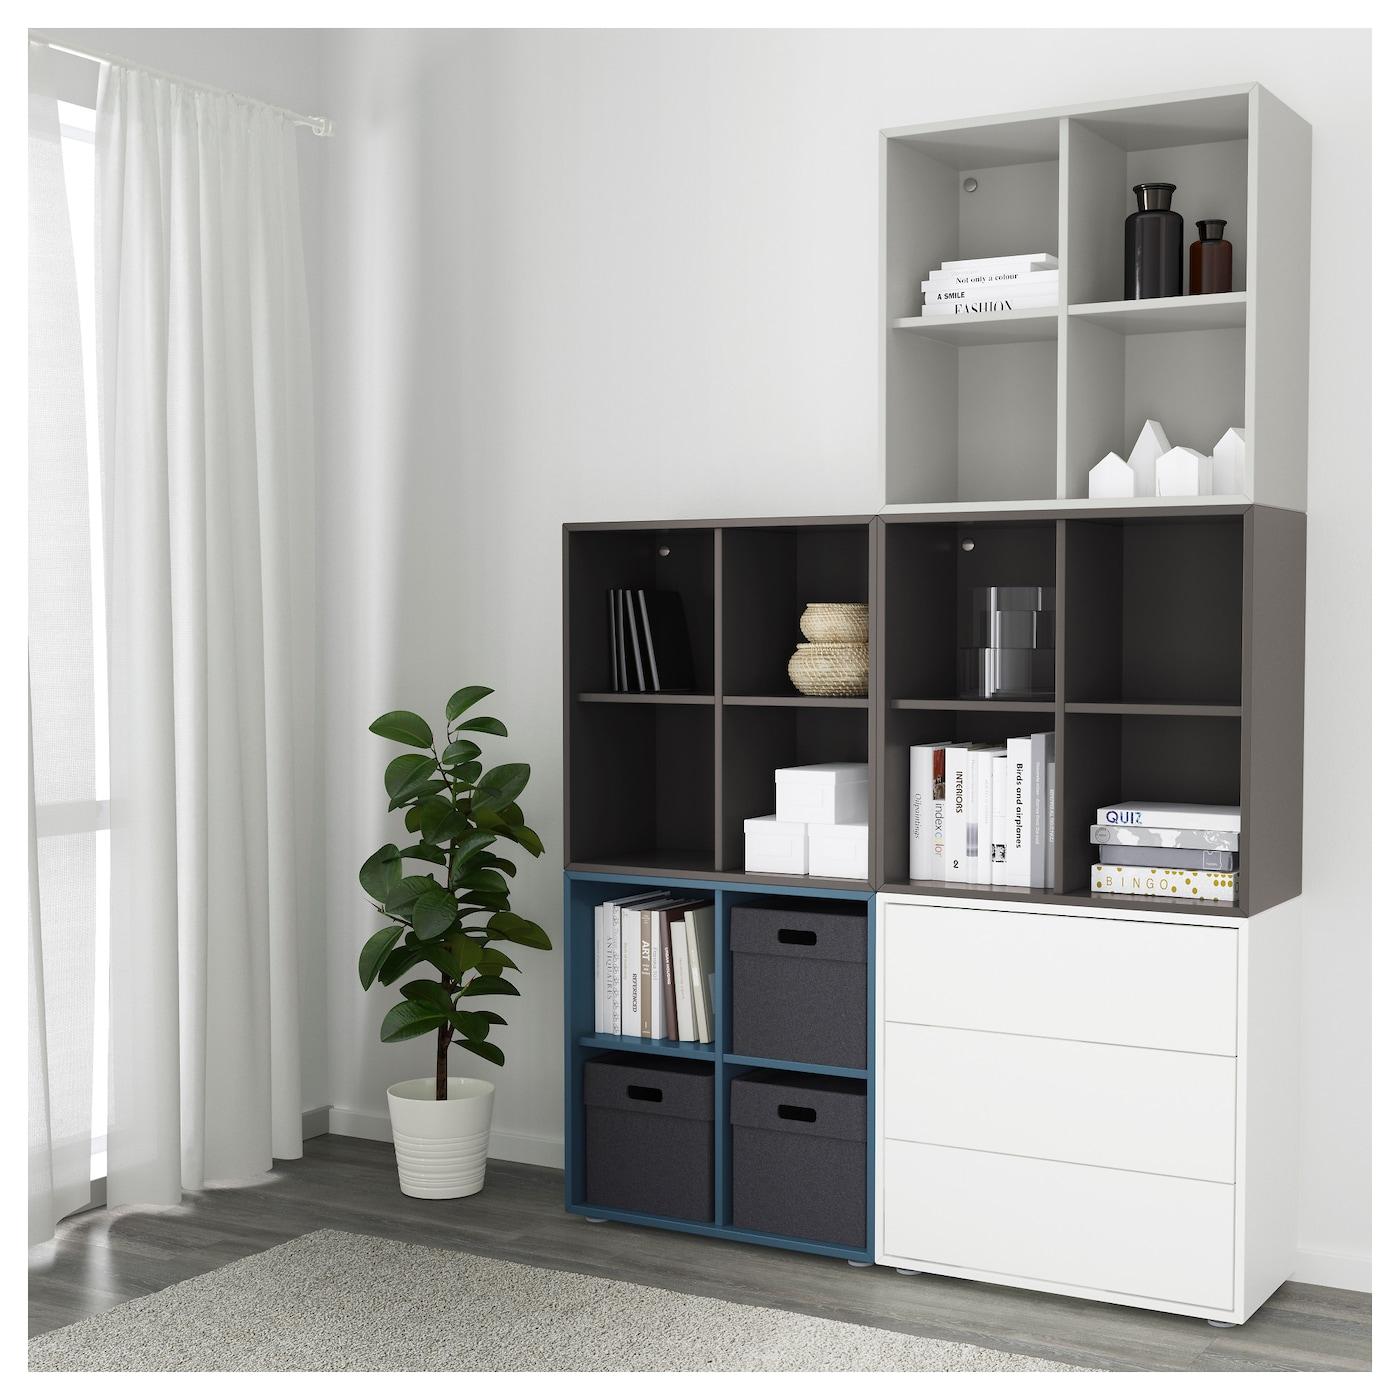 eket cabinet combination with feet multicolour 1 140 x 35 x 212 cm ikea. Black Bedroom Furniture Sets. Home Design Ideas